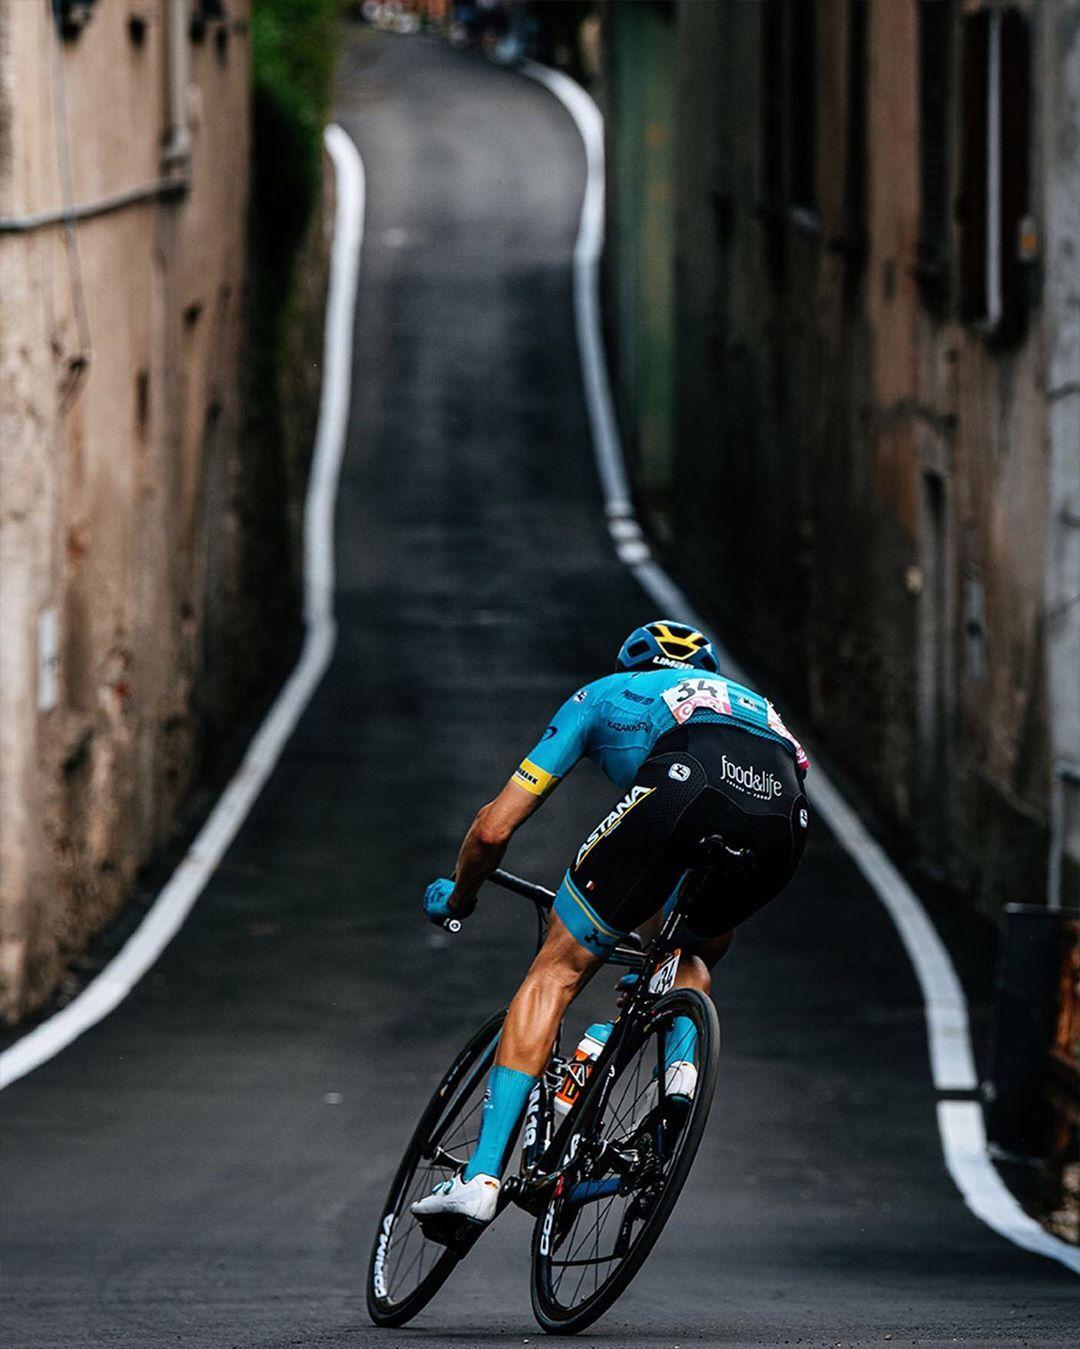 The Breakaway Survives! @dariocataldo wins Stage 15 of @giroditalia credit @jeredgruber / @ashleygr